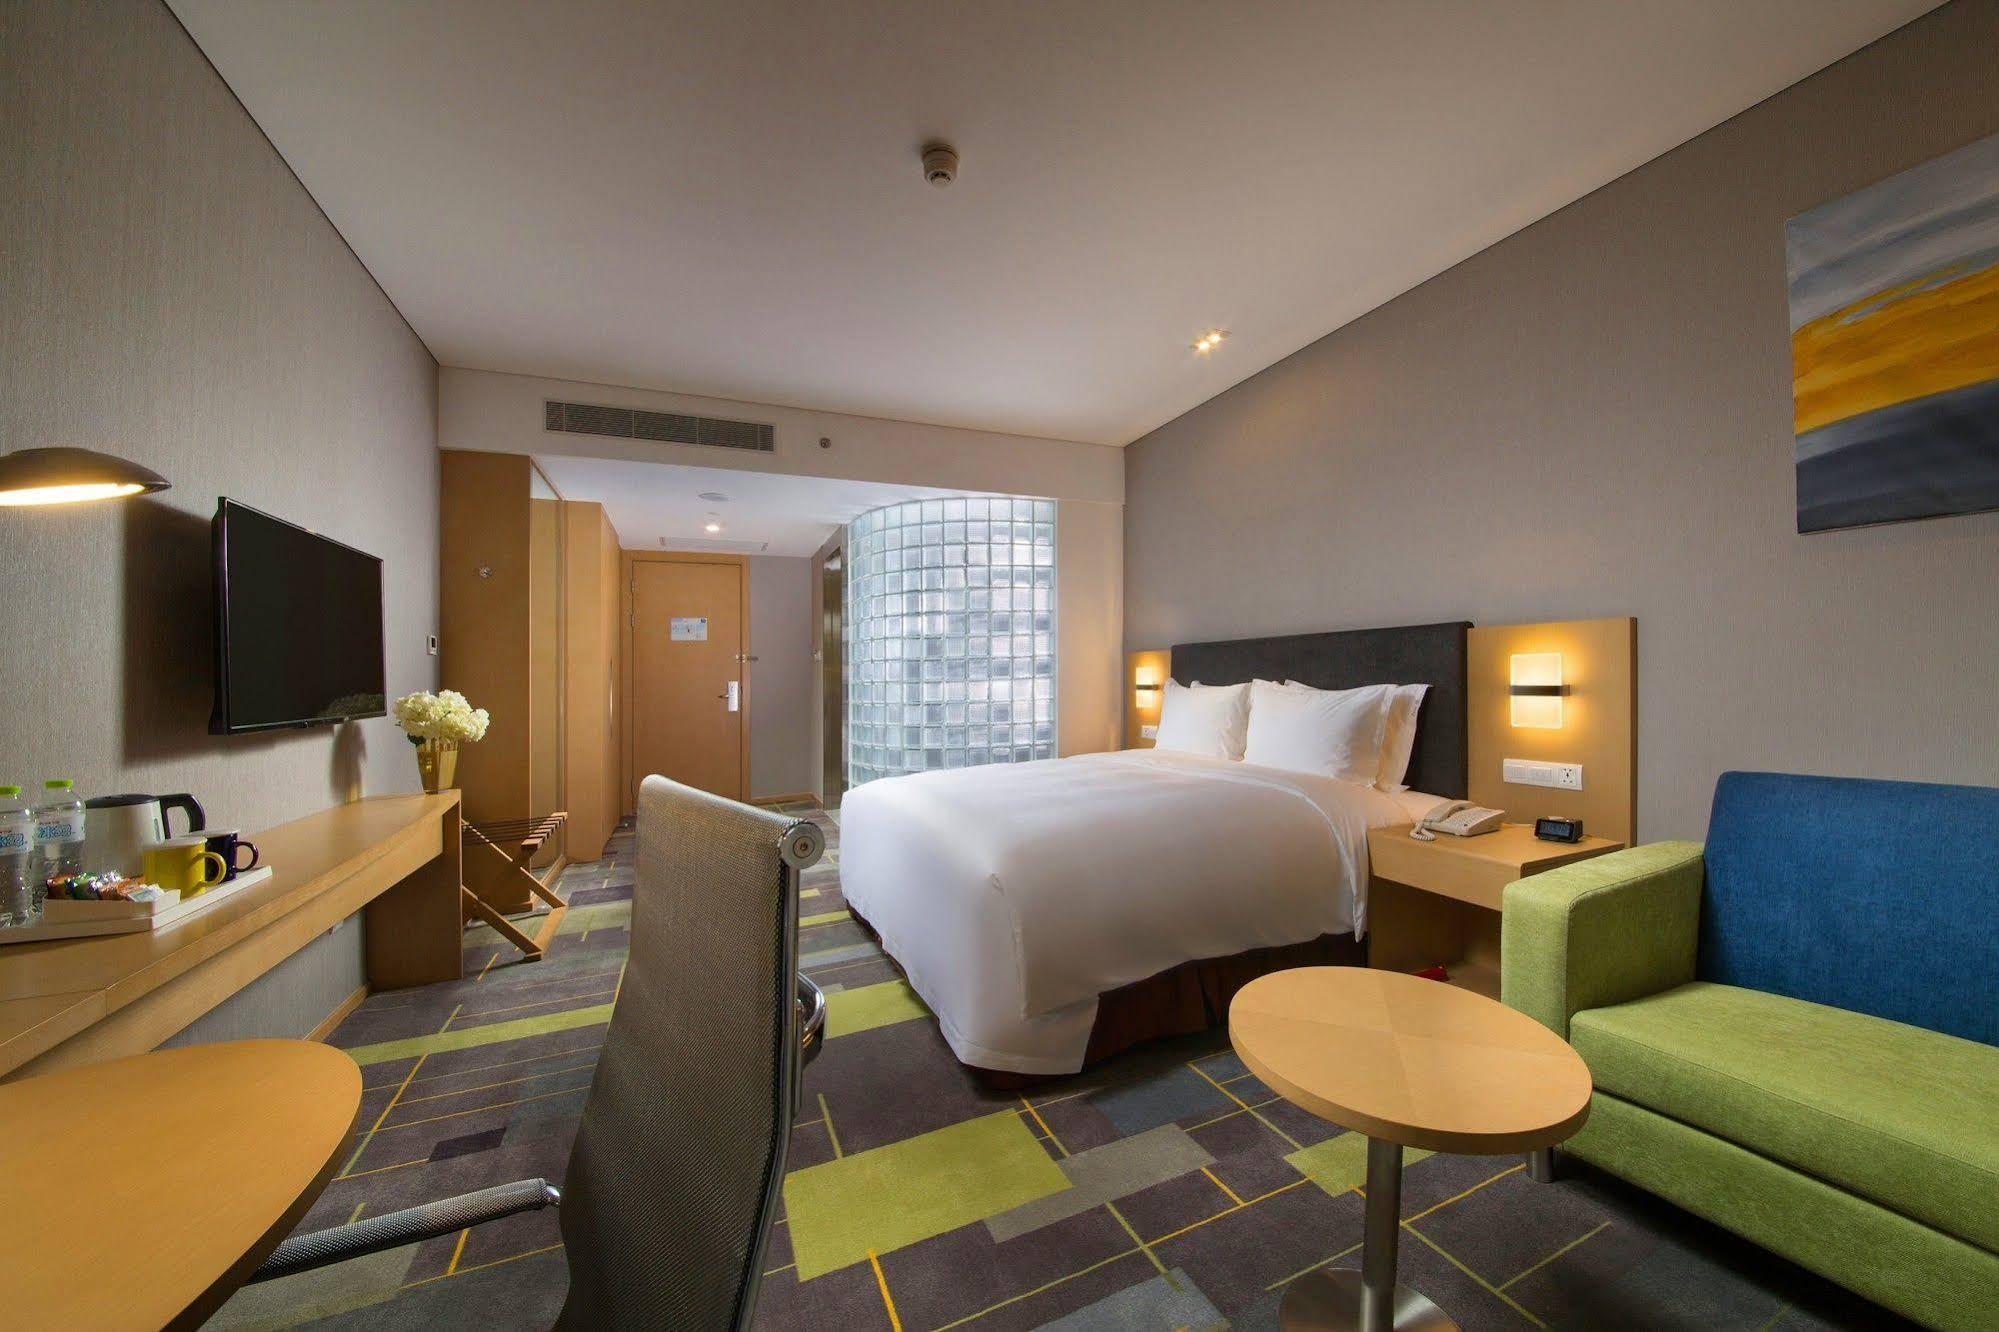 Holiday Inn Express Chengdu Dafeng